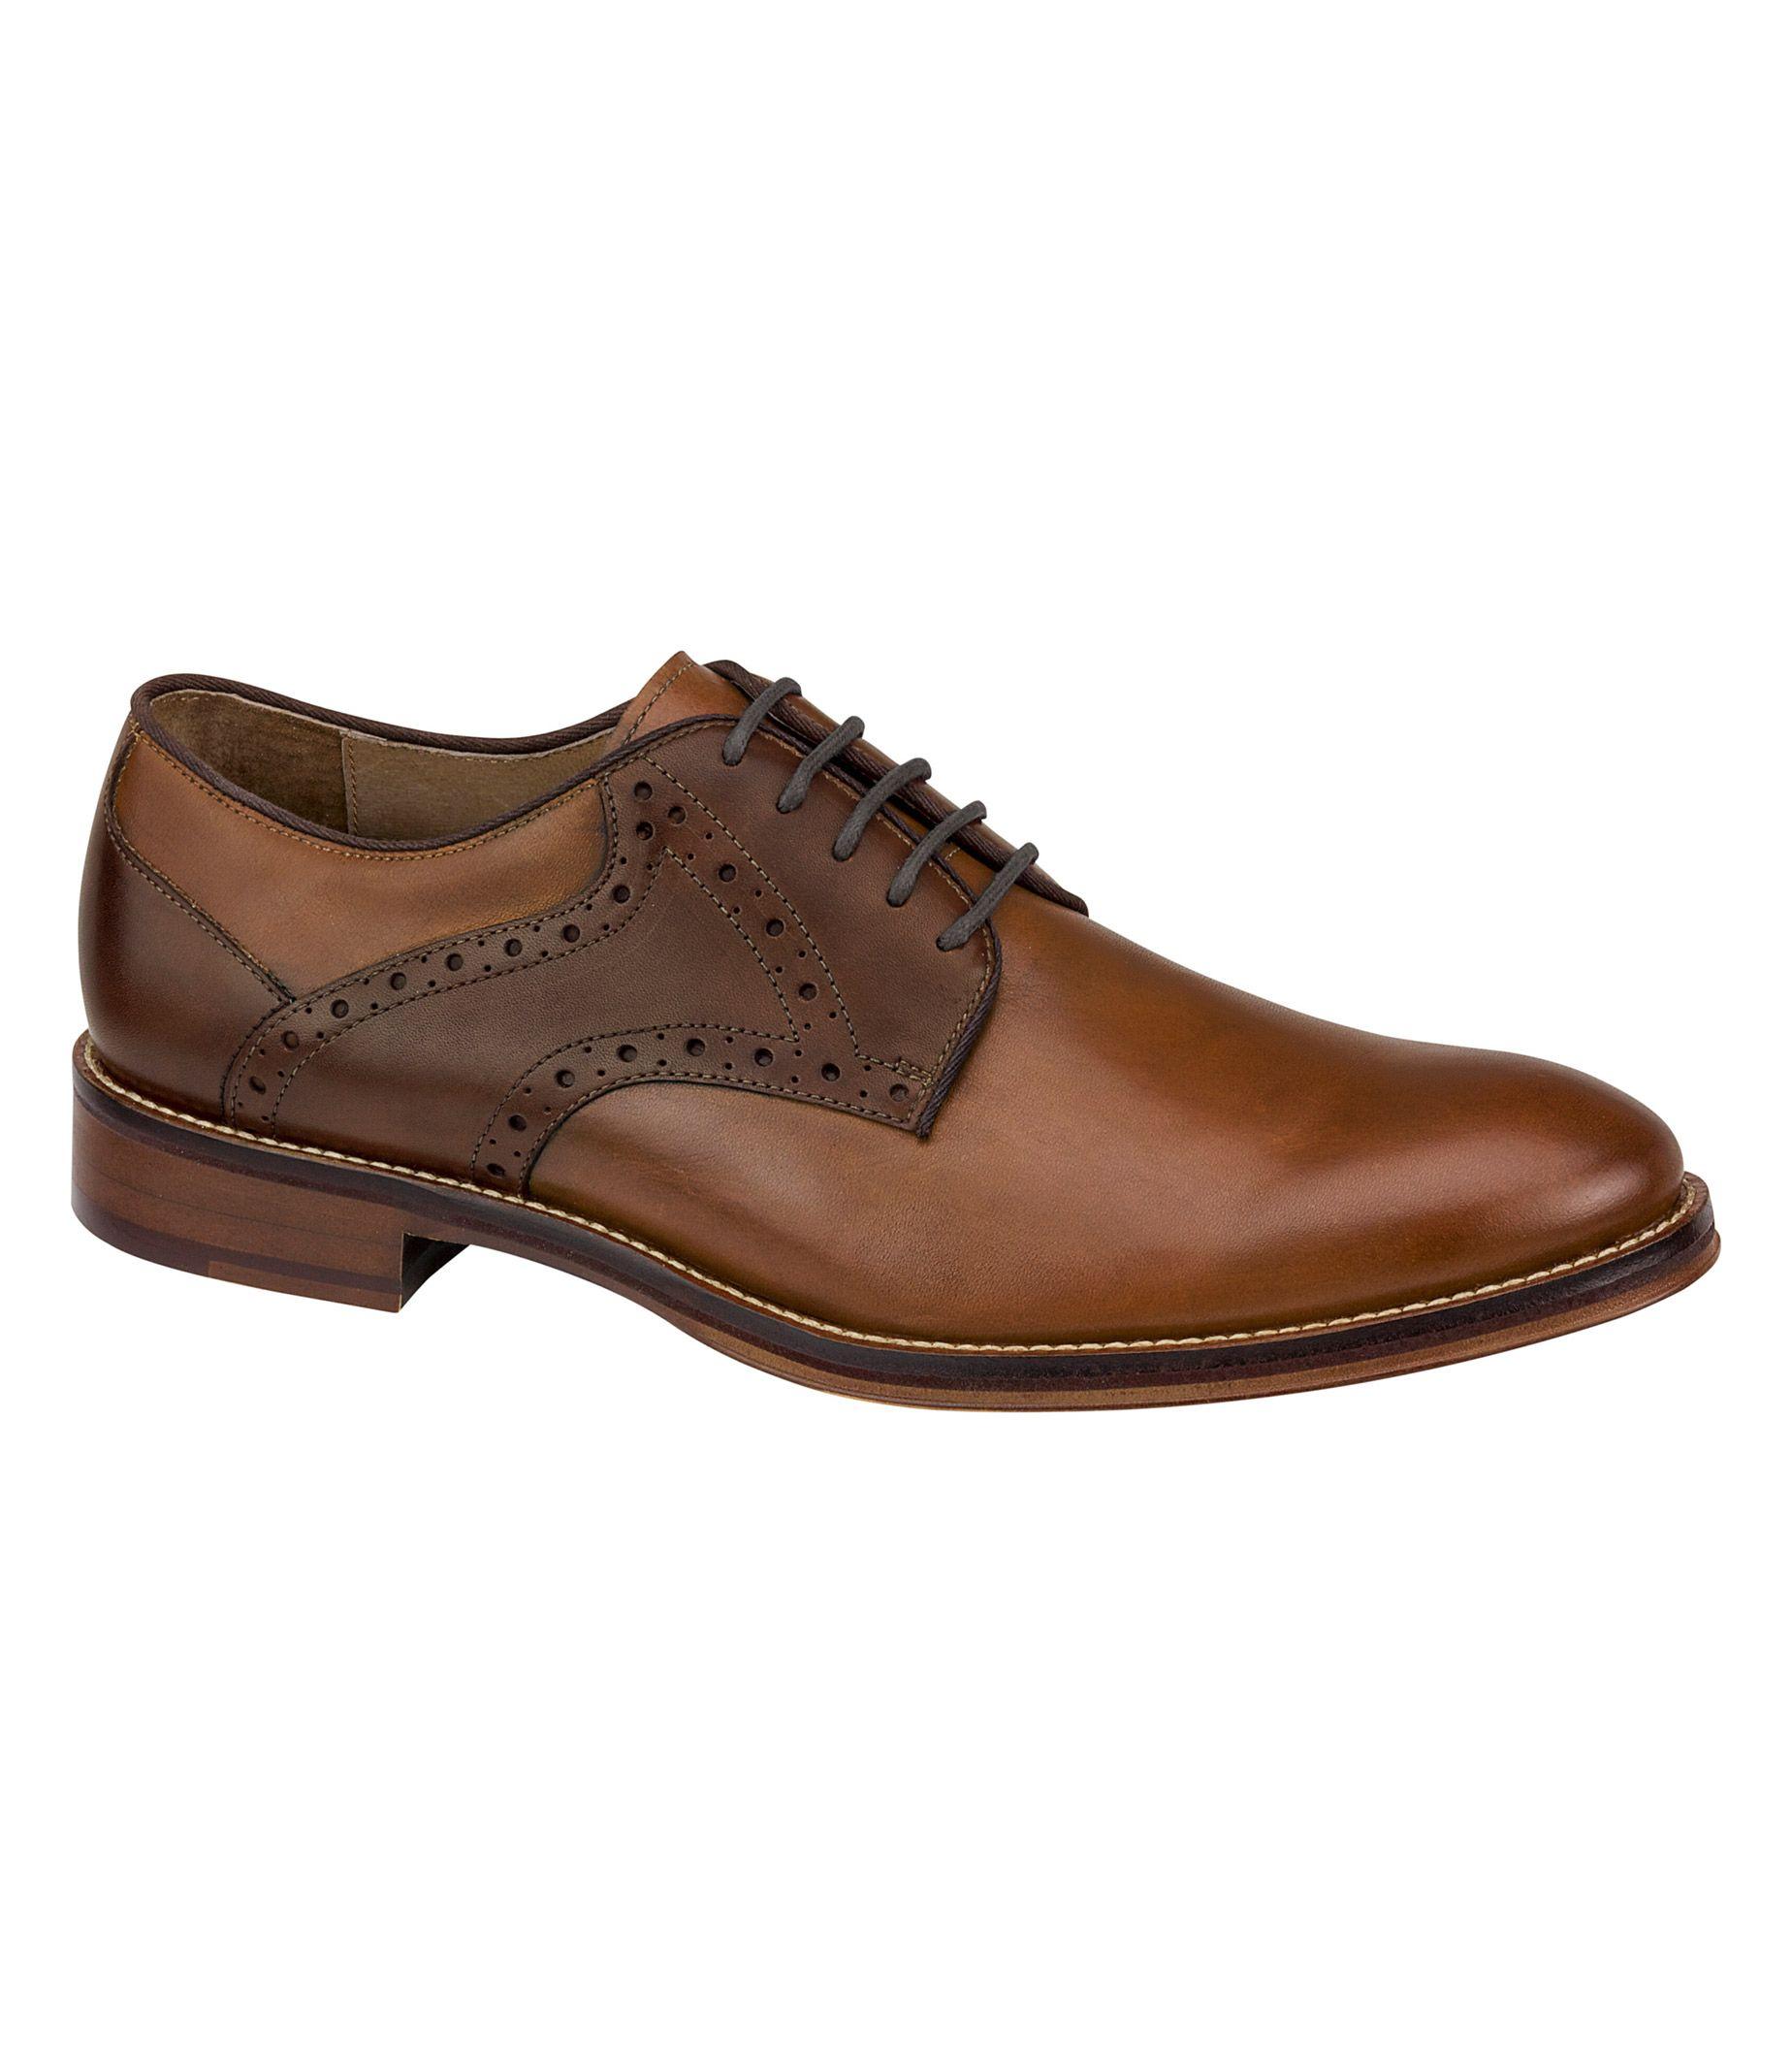 Johnston Murphy Conard Conard Saddle Shoe by Johnston